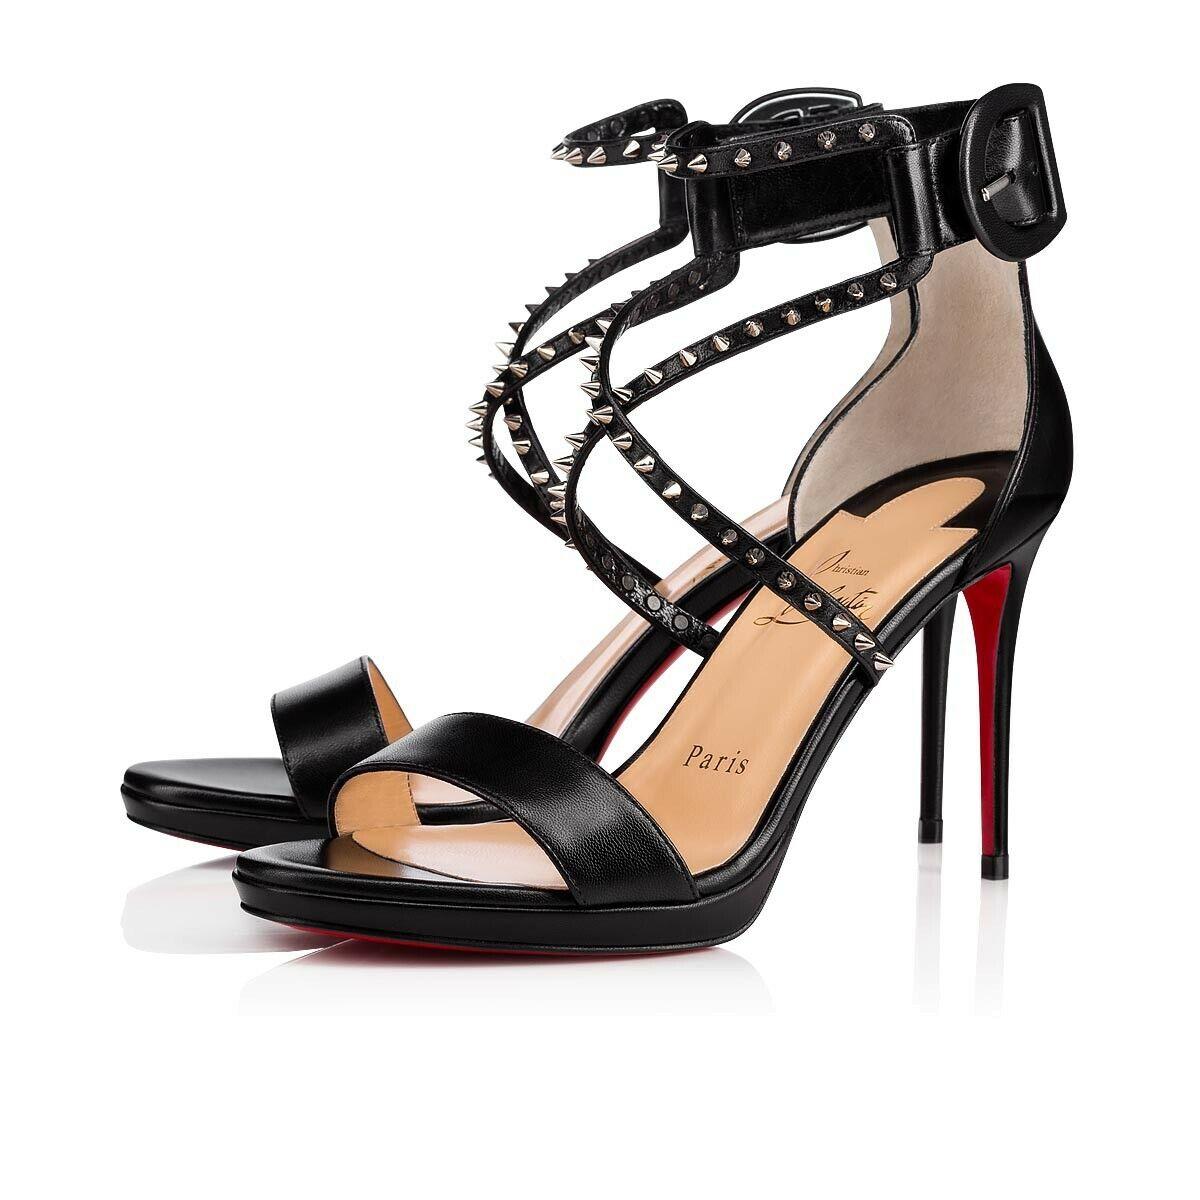 New Christian Louboutin  Choca Kid 100 High Leather donna Sandals Heels Dimensione 41  alto sconto